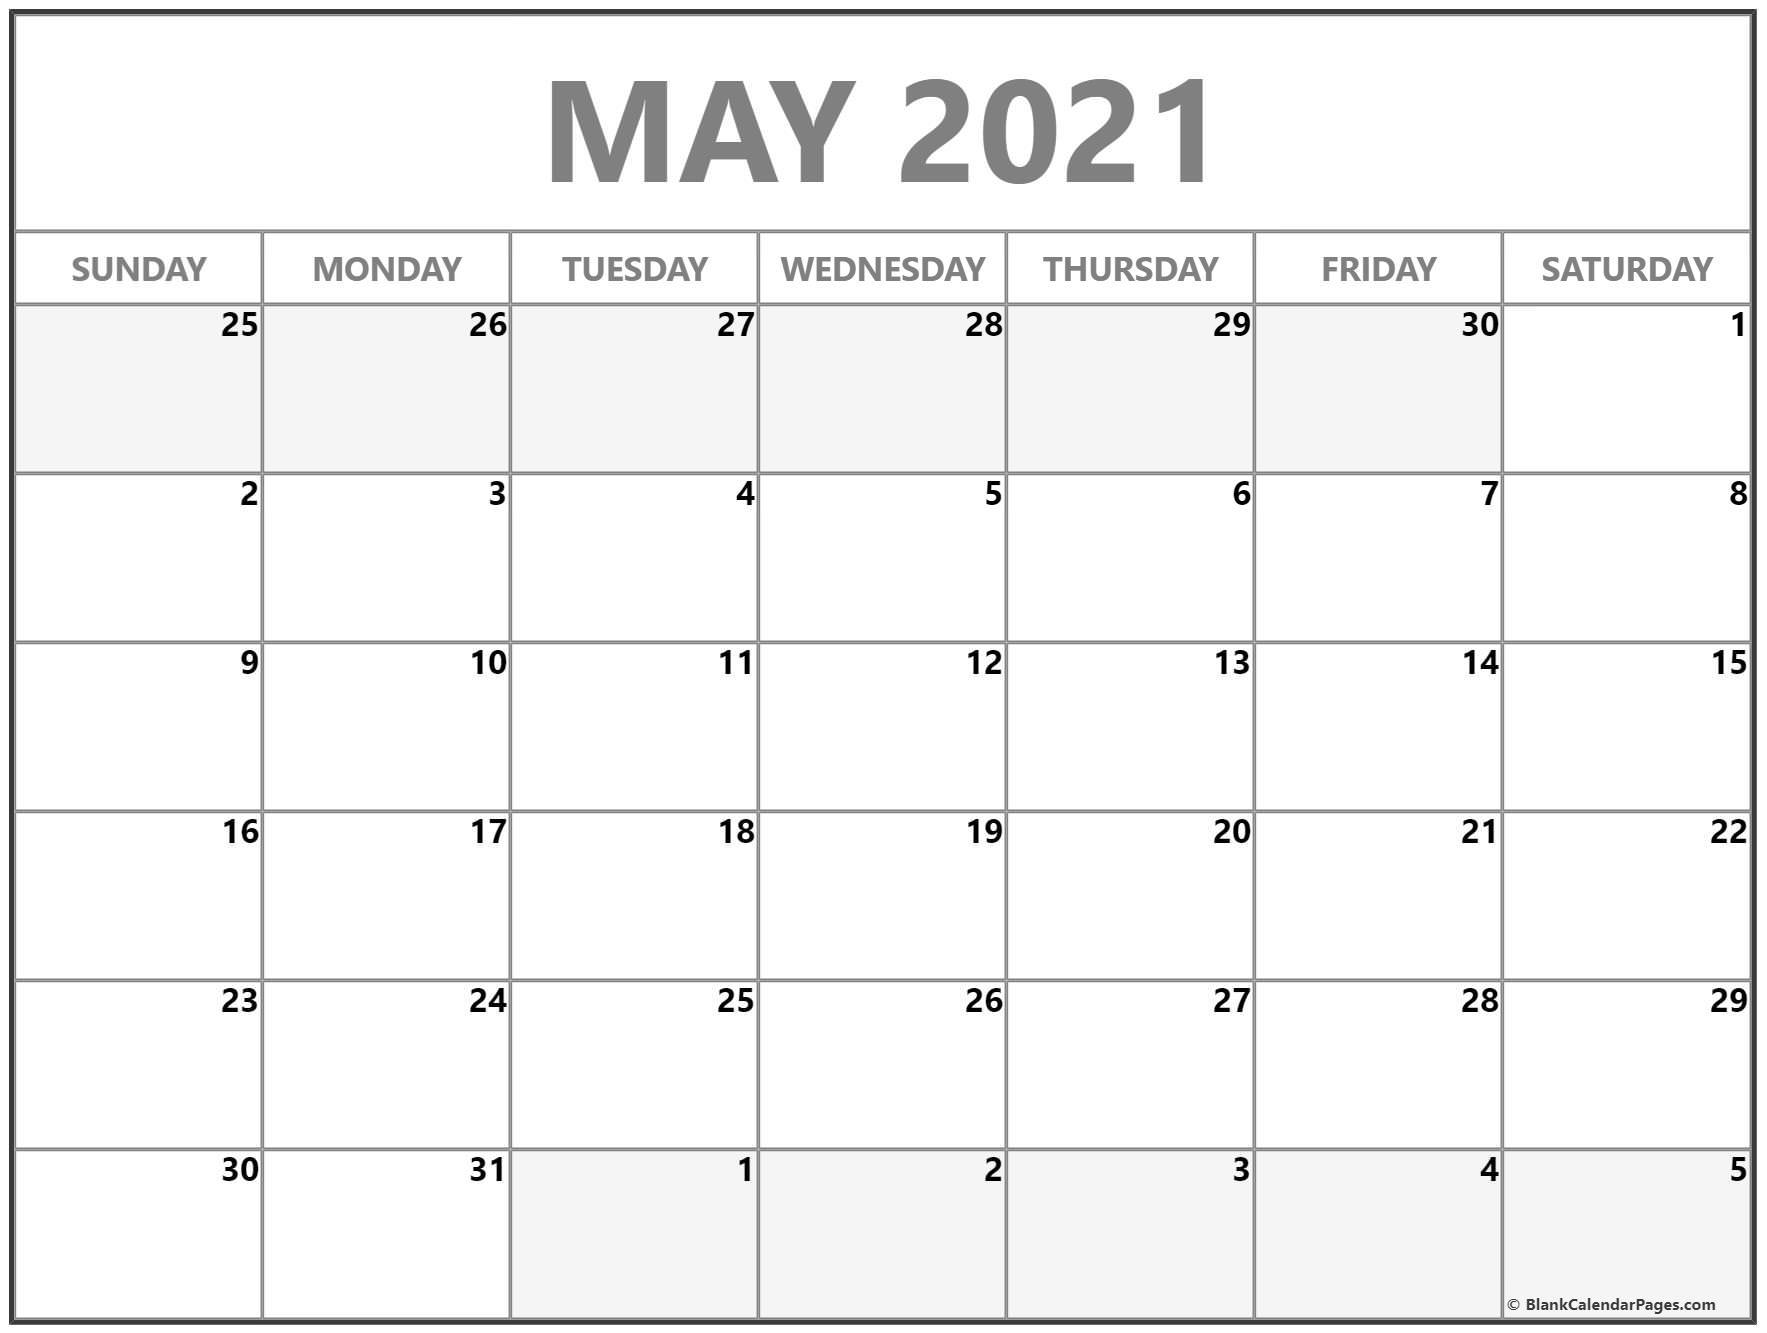 May 2021 Calendar | Free Printable Calendar Templates pertaining to Free Printable Calendars 2021 With Lines